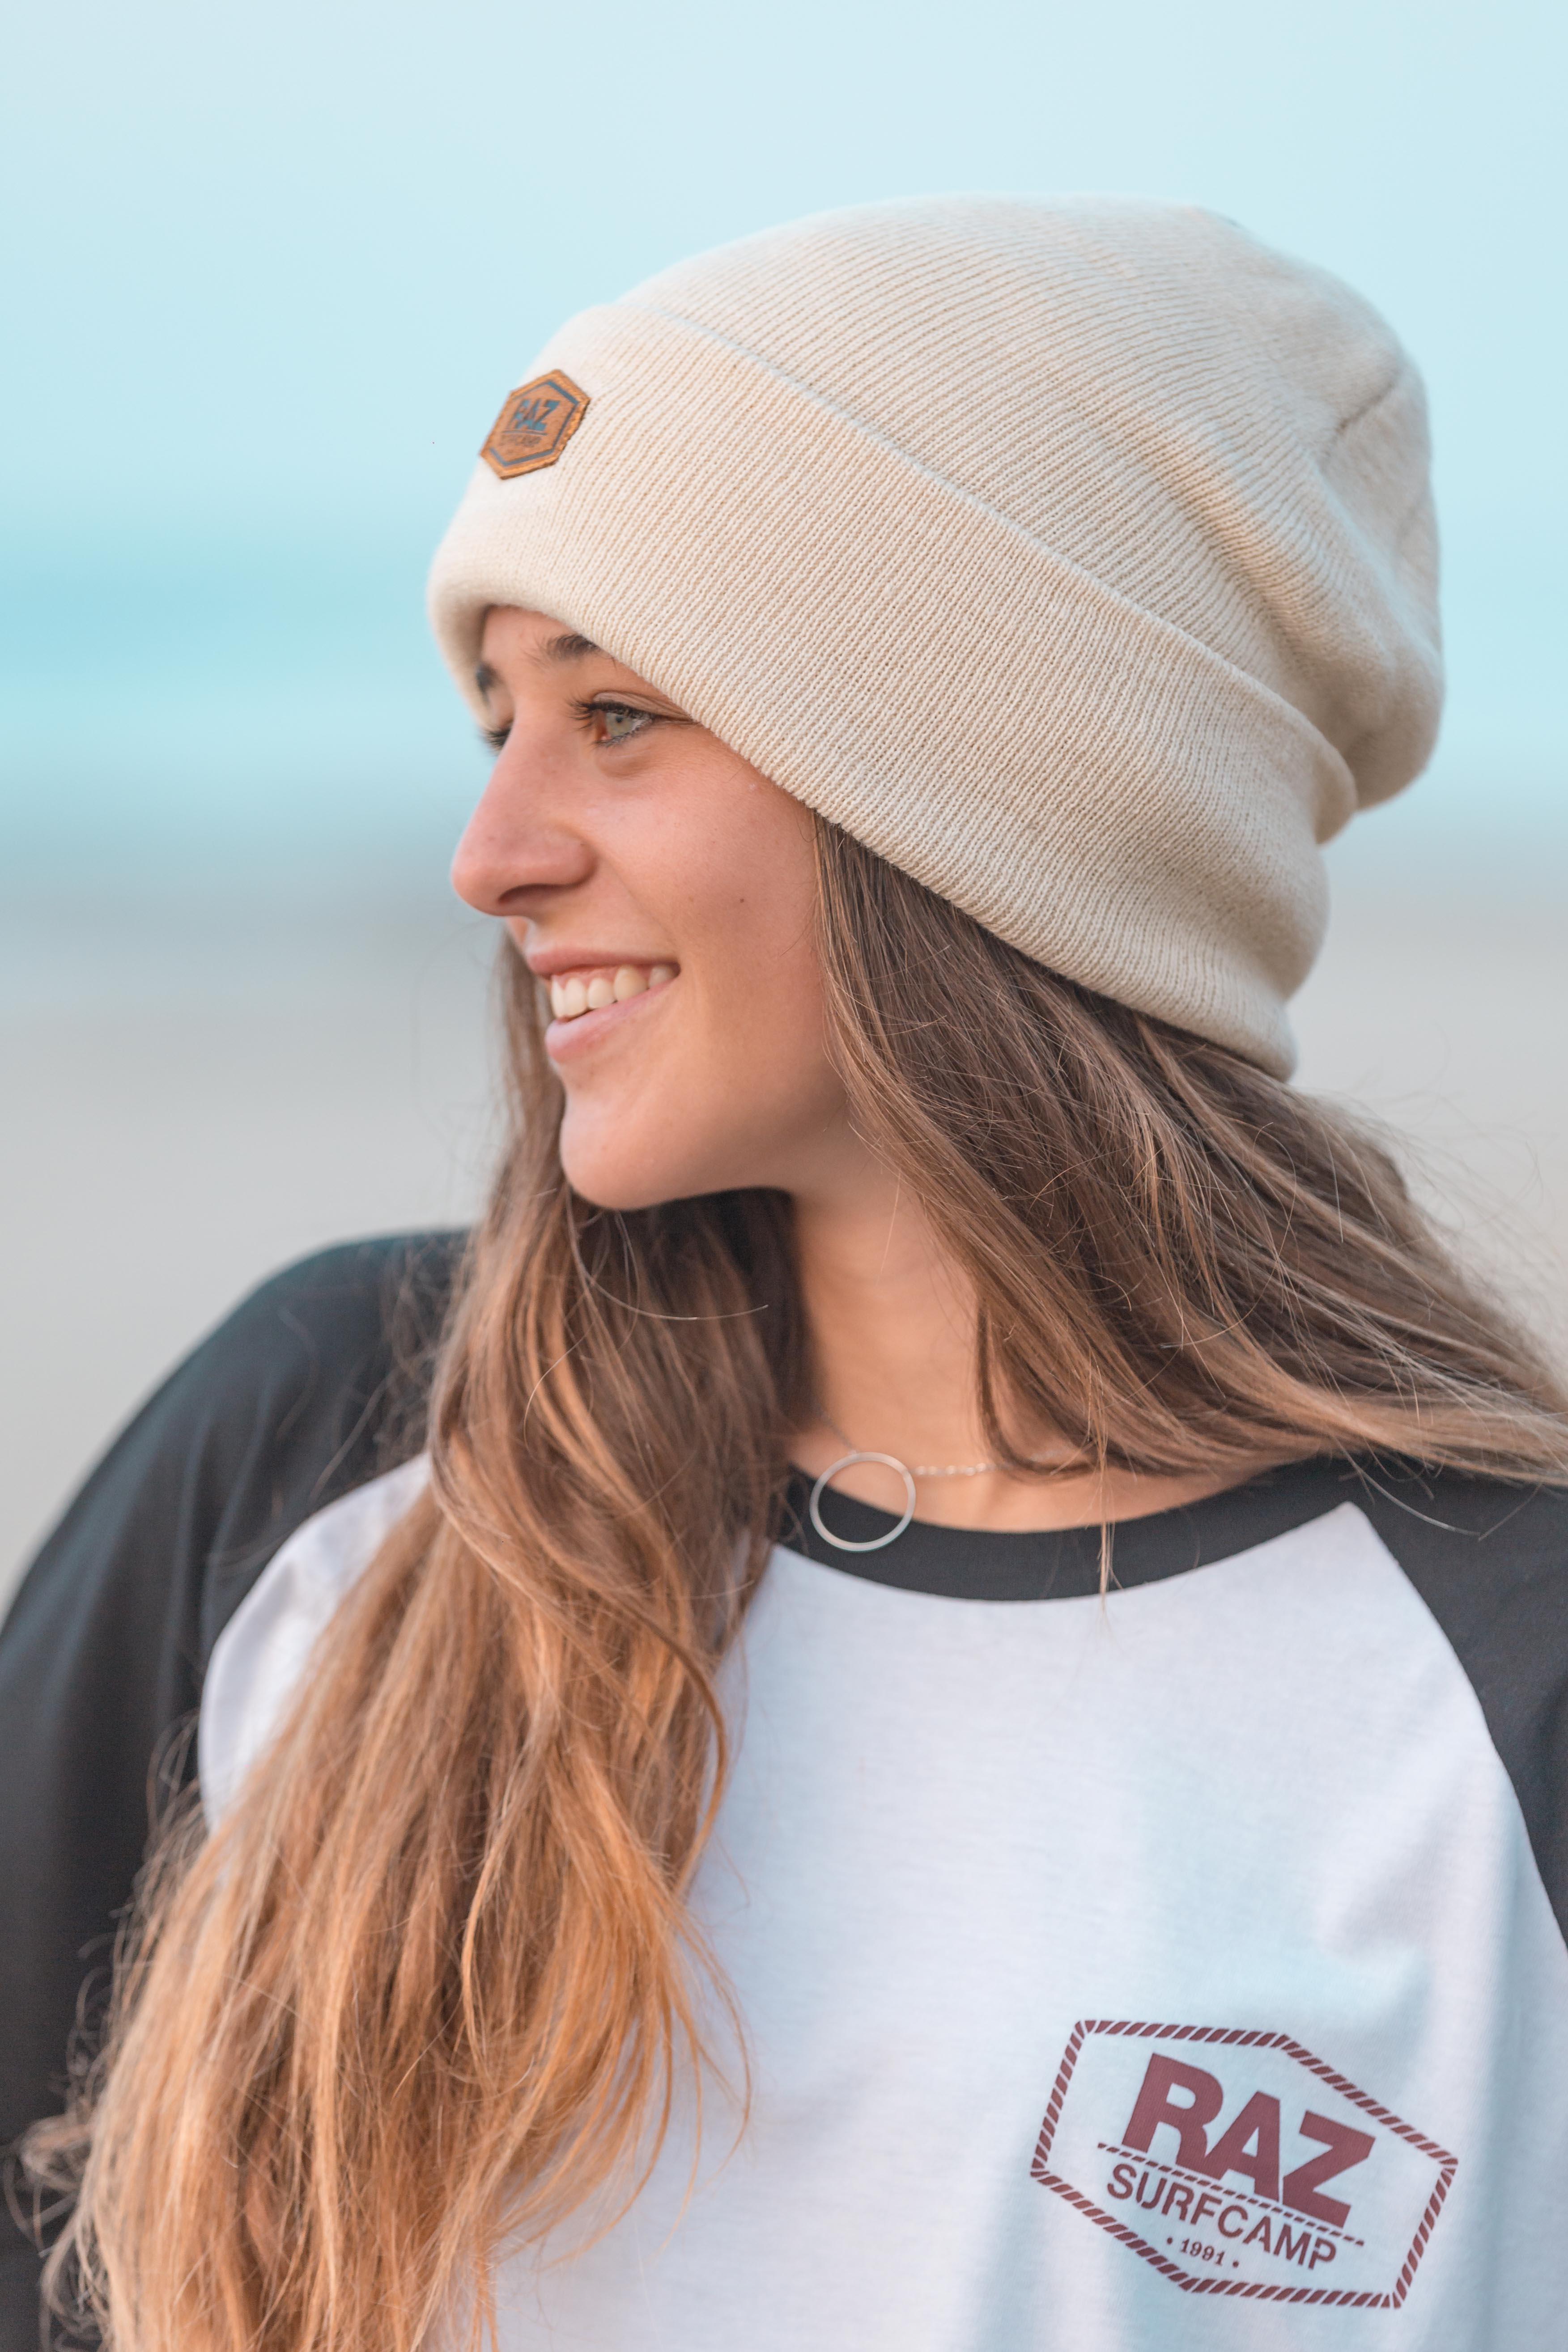 moda surfera streetwear surfing clothing raz surfcamp razo praia playa